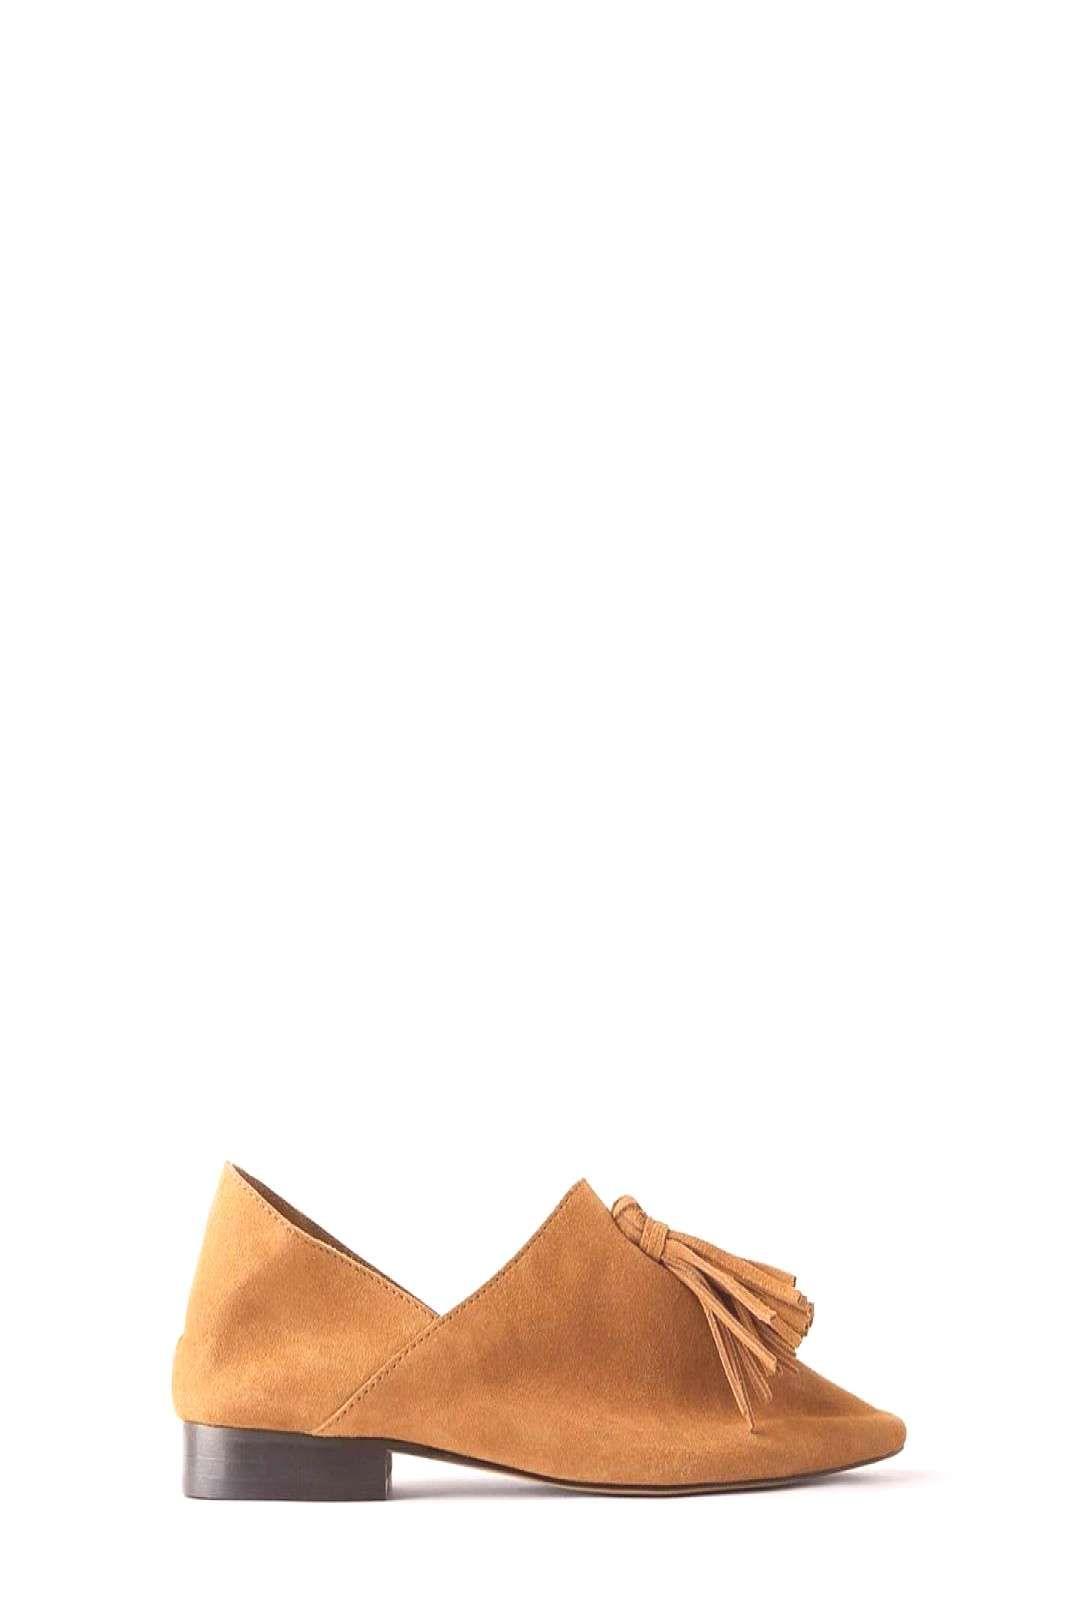 #newcollection #zaraykpnh #zaraykph #shoes #zara #1199 #br #z Zara #newcollection 1199 +Bаrа zaraykpаNHа #zaraykpаїHа #zYou can find Zara kids and more on our website.Zara #newcollection 1199 +Bаrа zaraykpаNHа #zaraykpаїHа #z